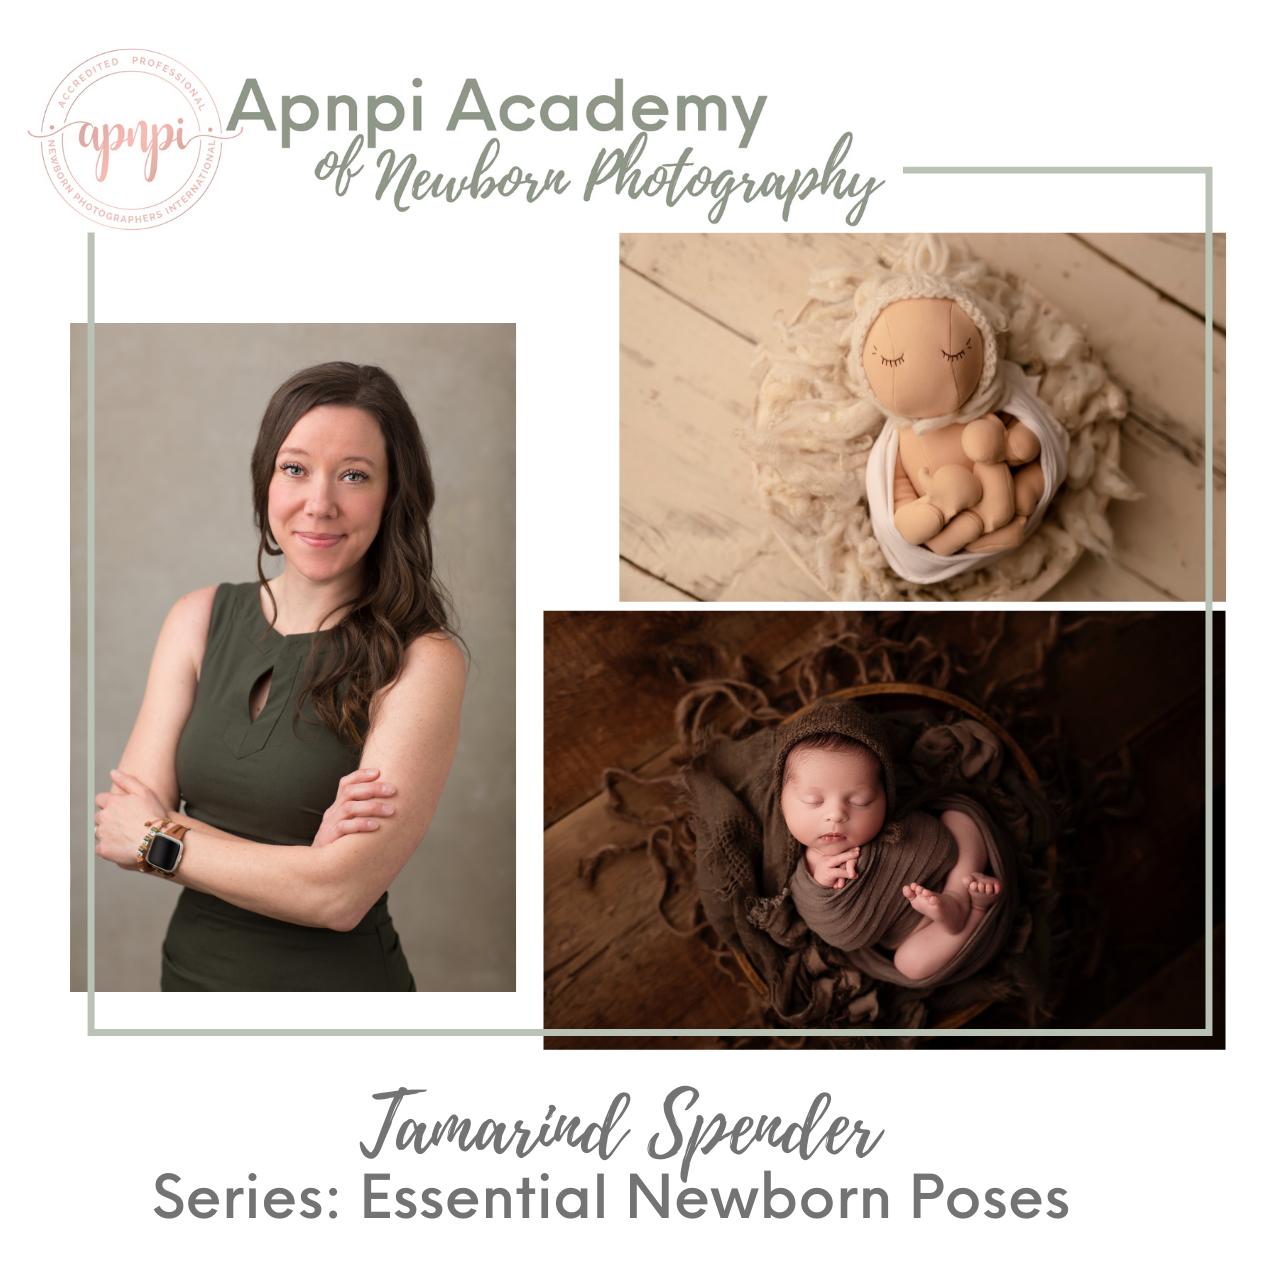 Tamarind Spender Azure Newborn Photography Posing APNPI Academy Course